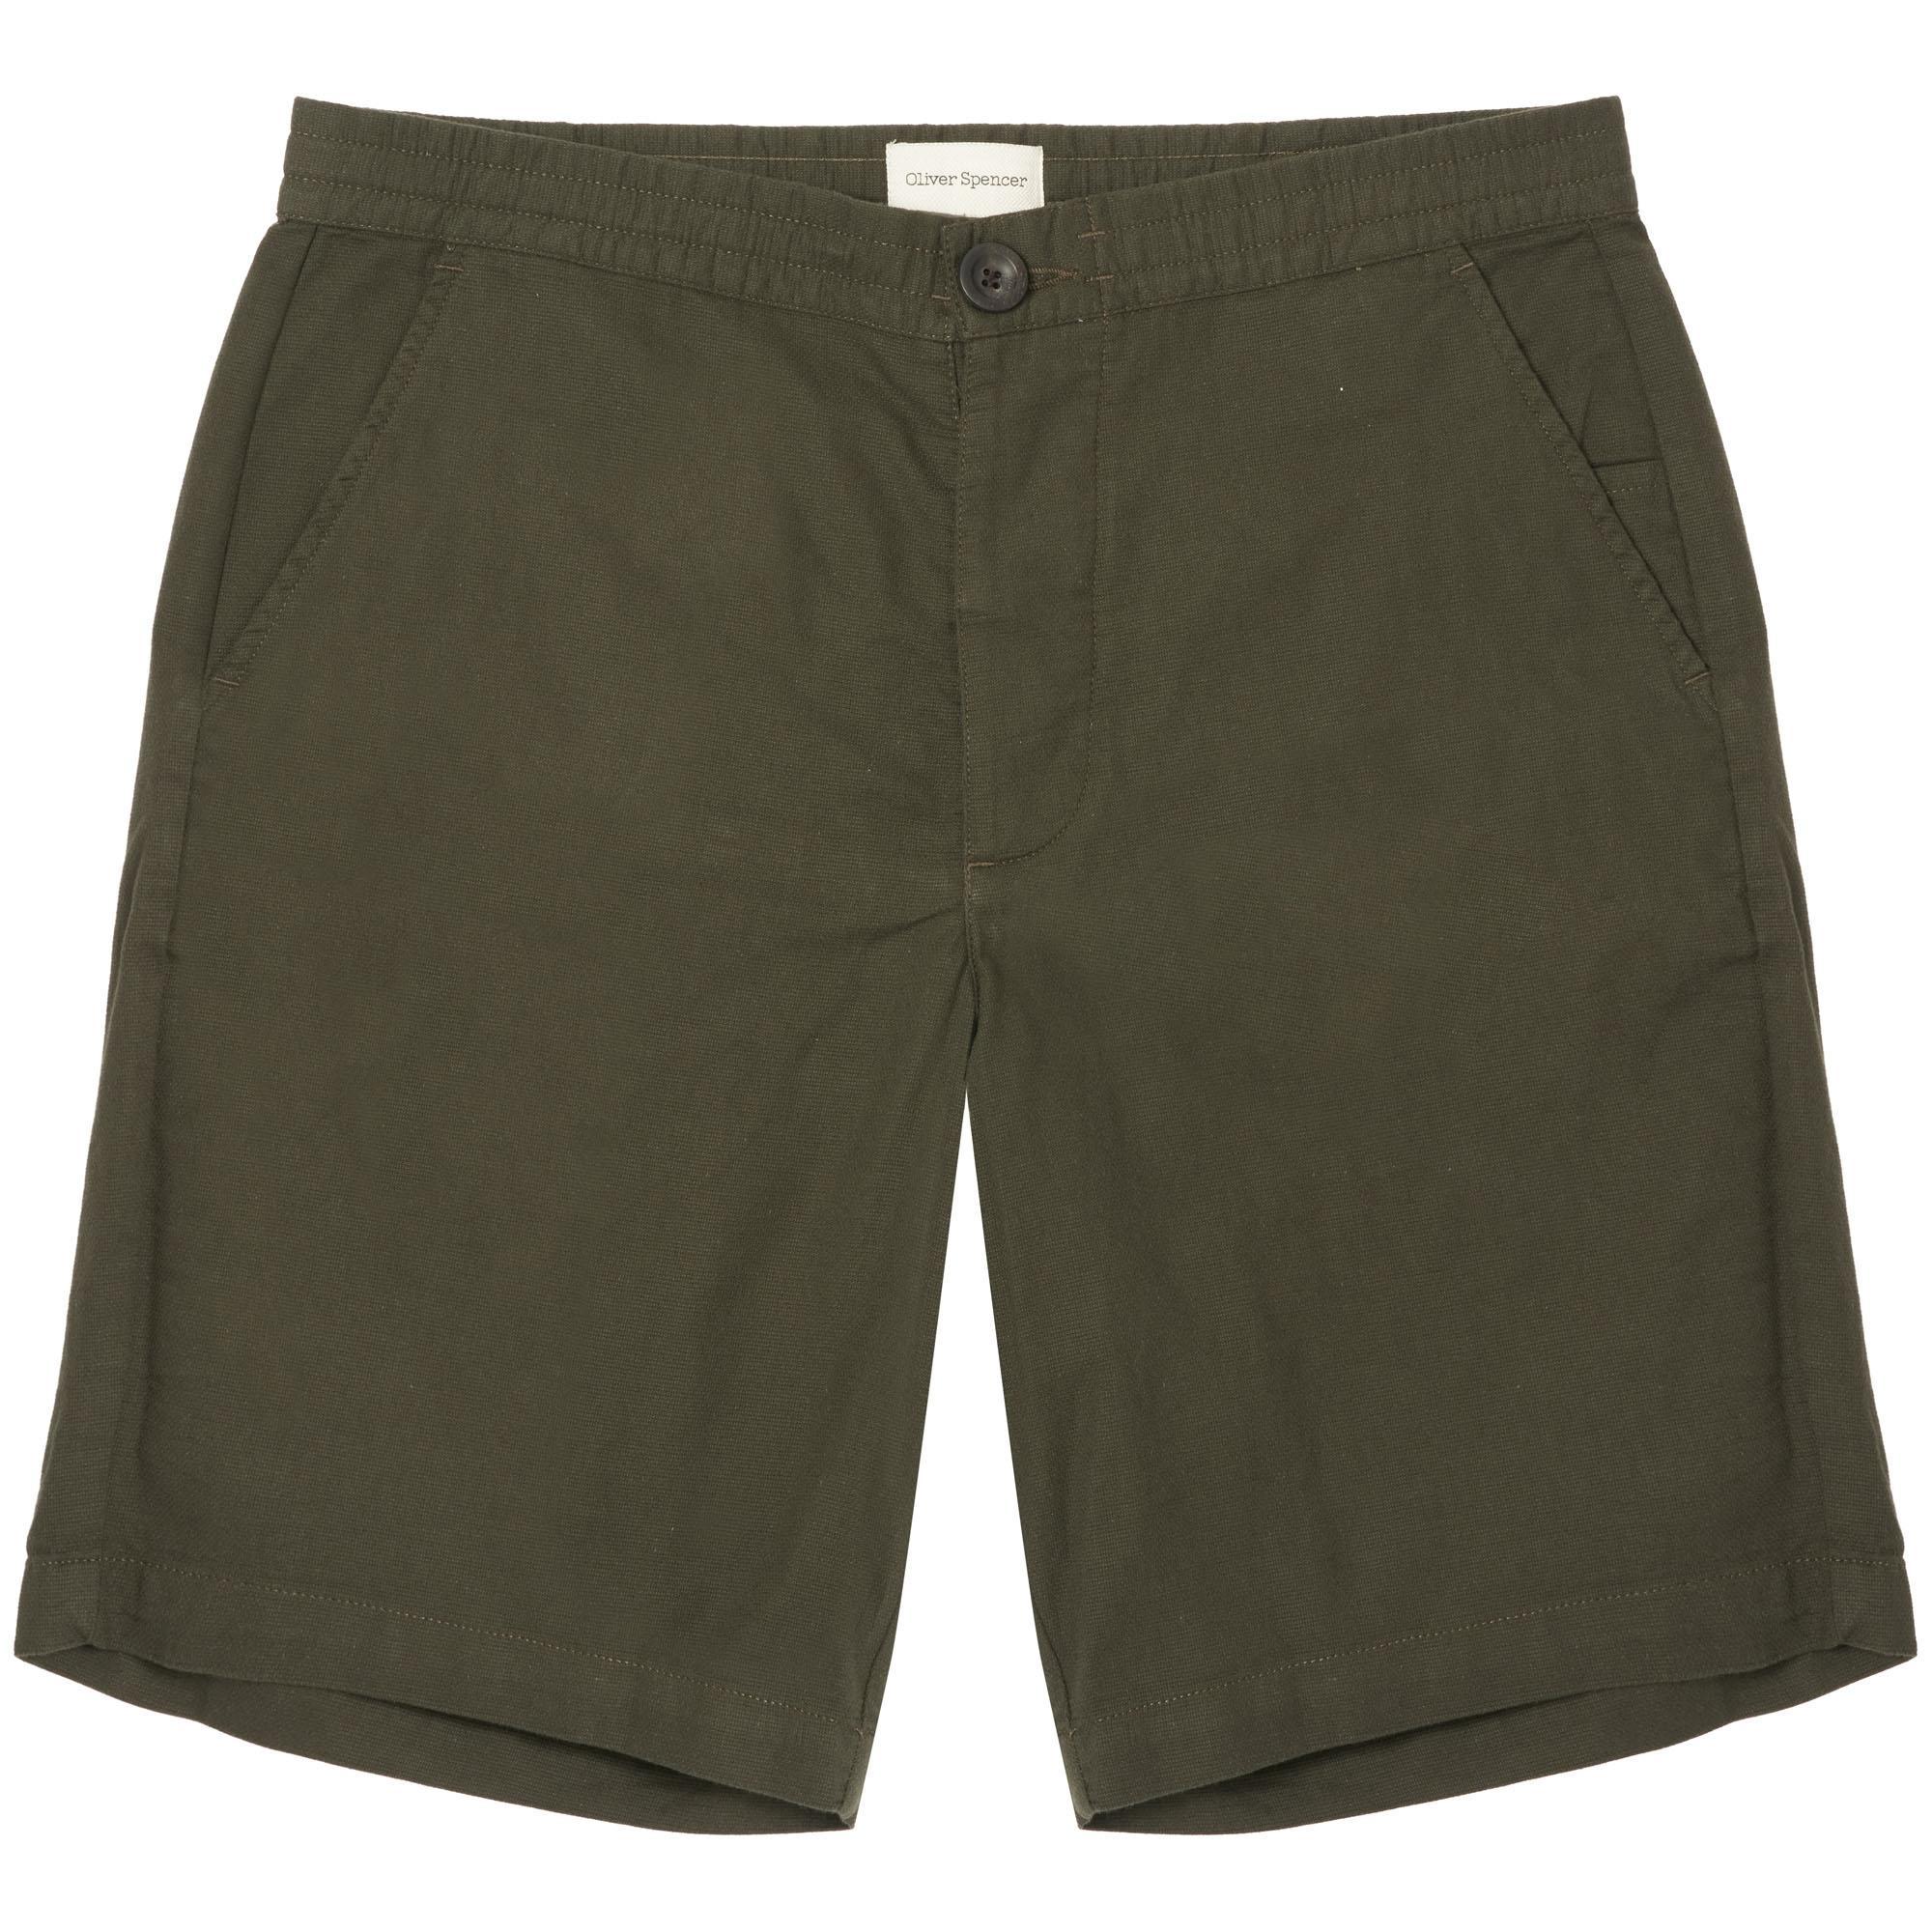 Checked Cotton Drawstring Shorts Oliver Spencer LEQFgjs